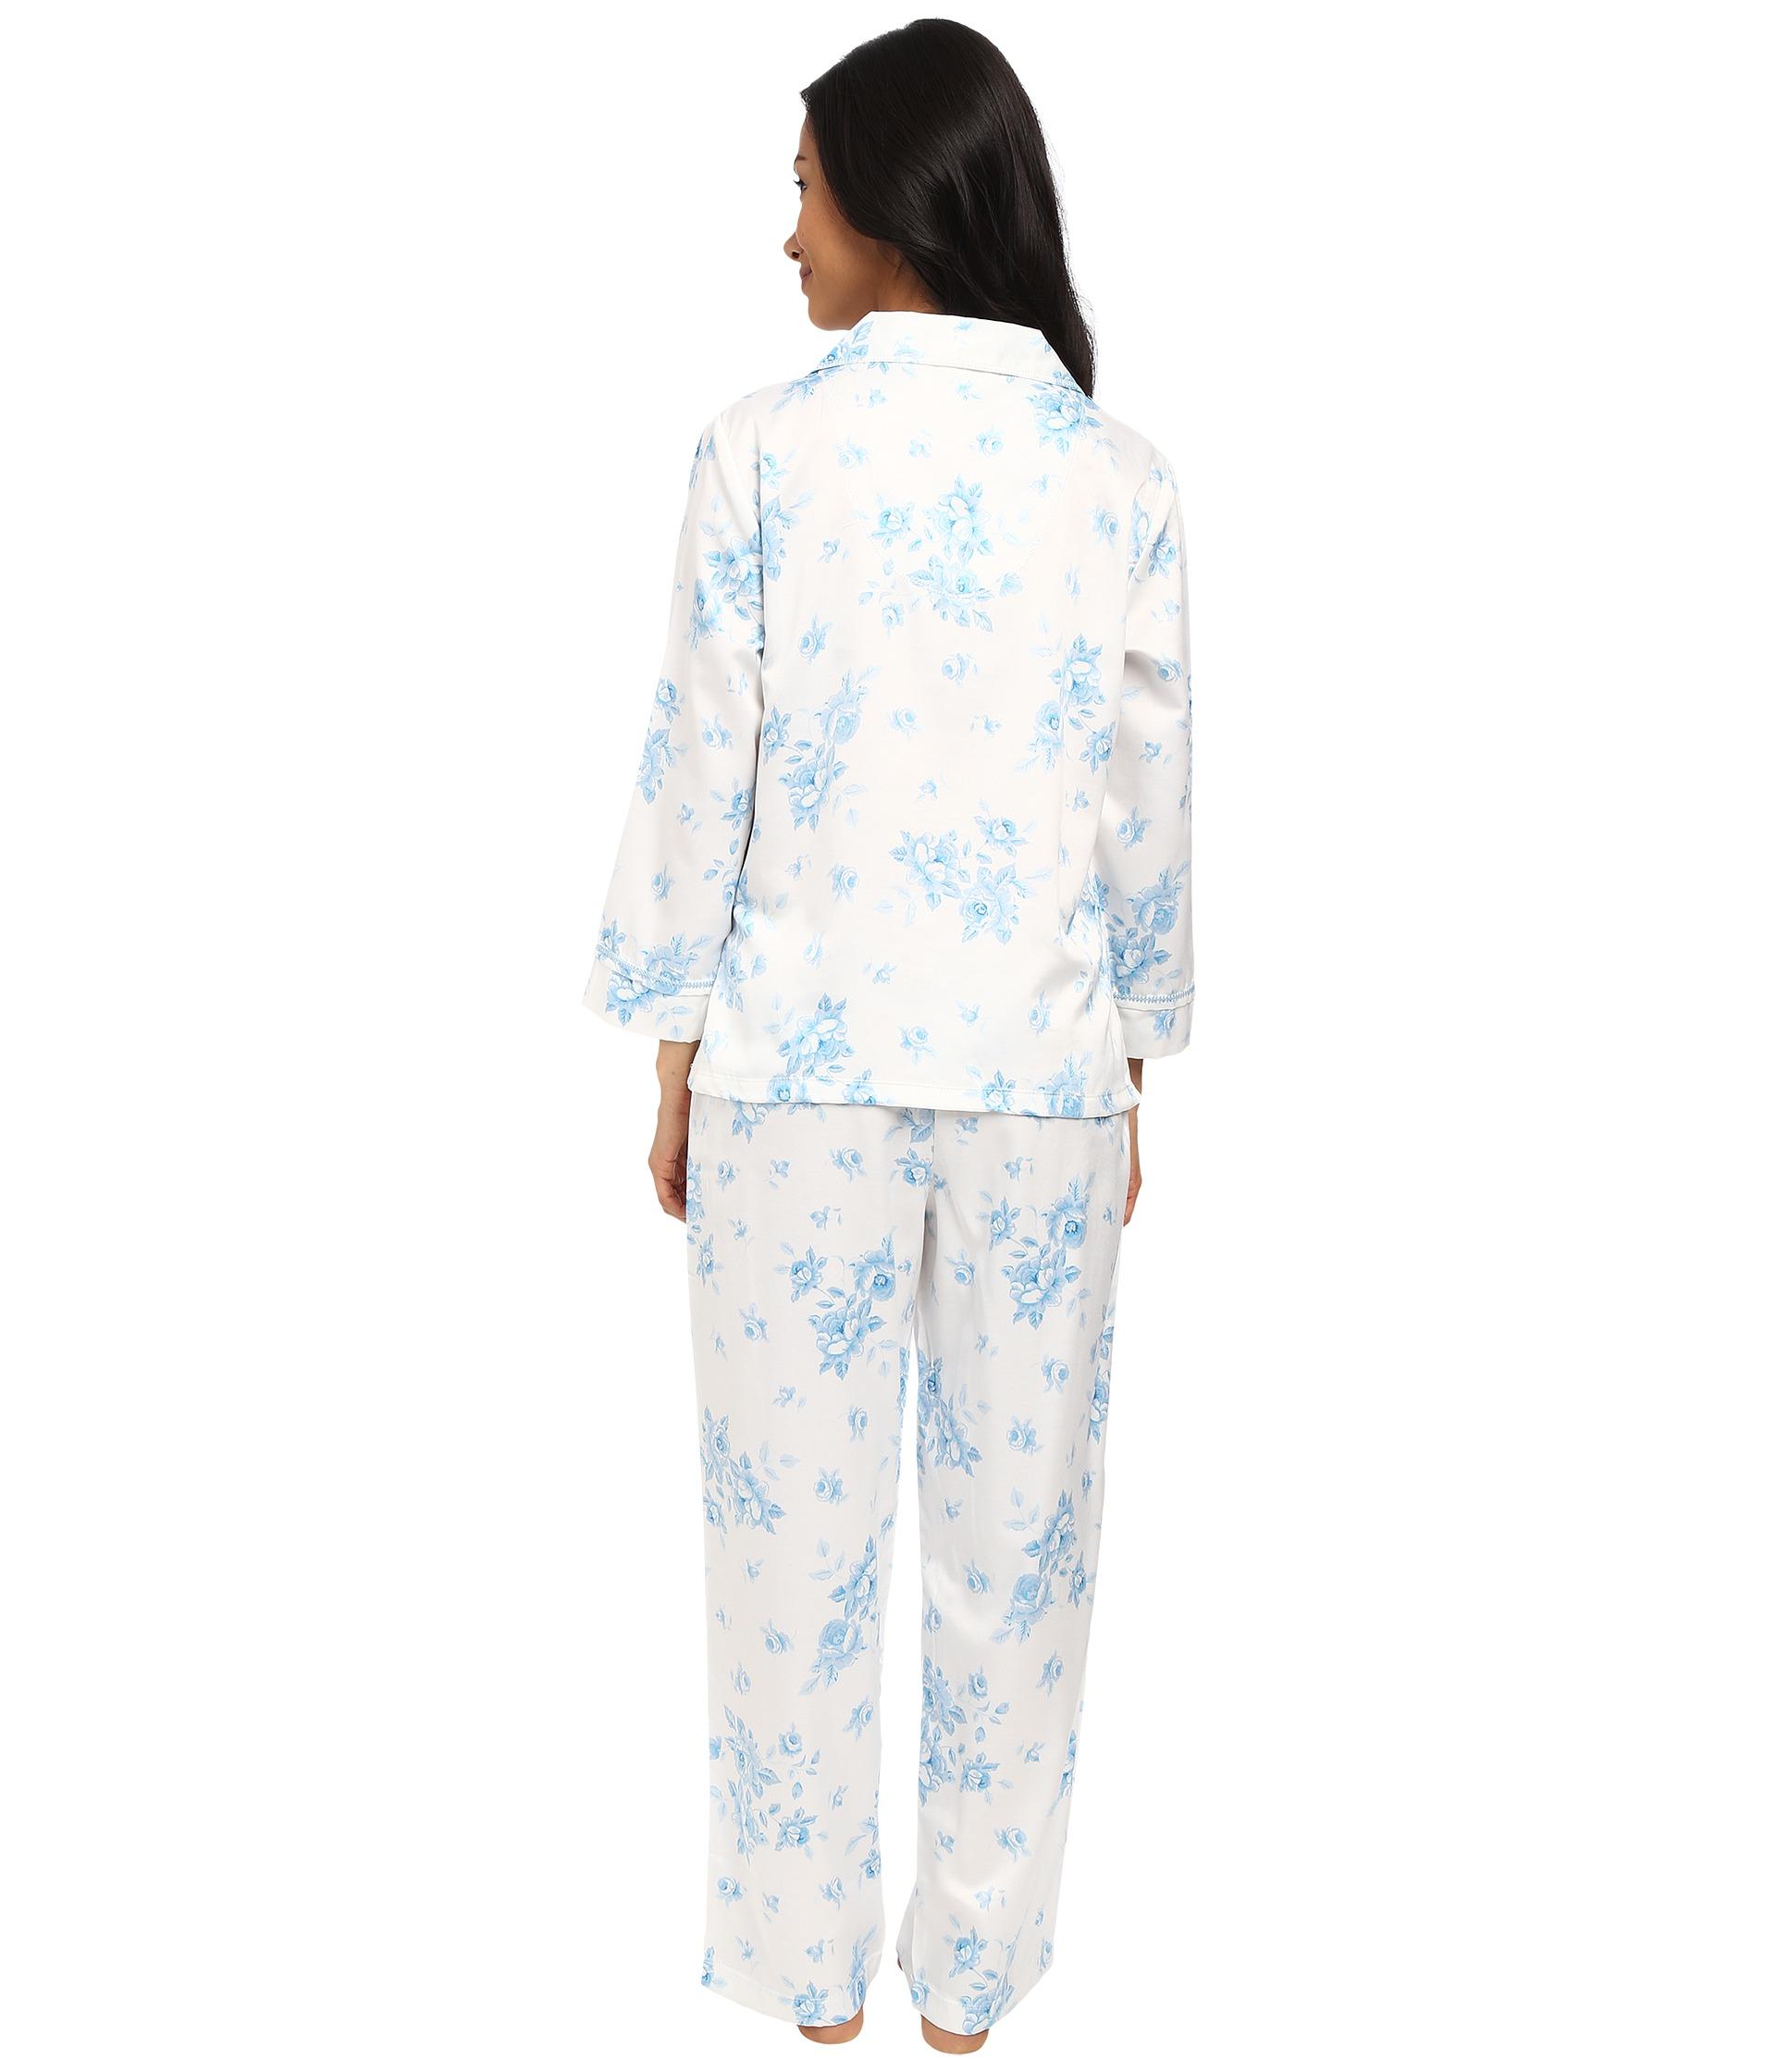 Lyst Carole Hochman Petite Packaged Brush Back Satin Pajama in Blue